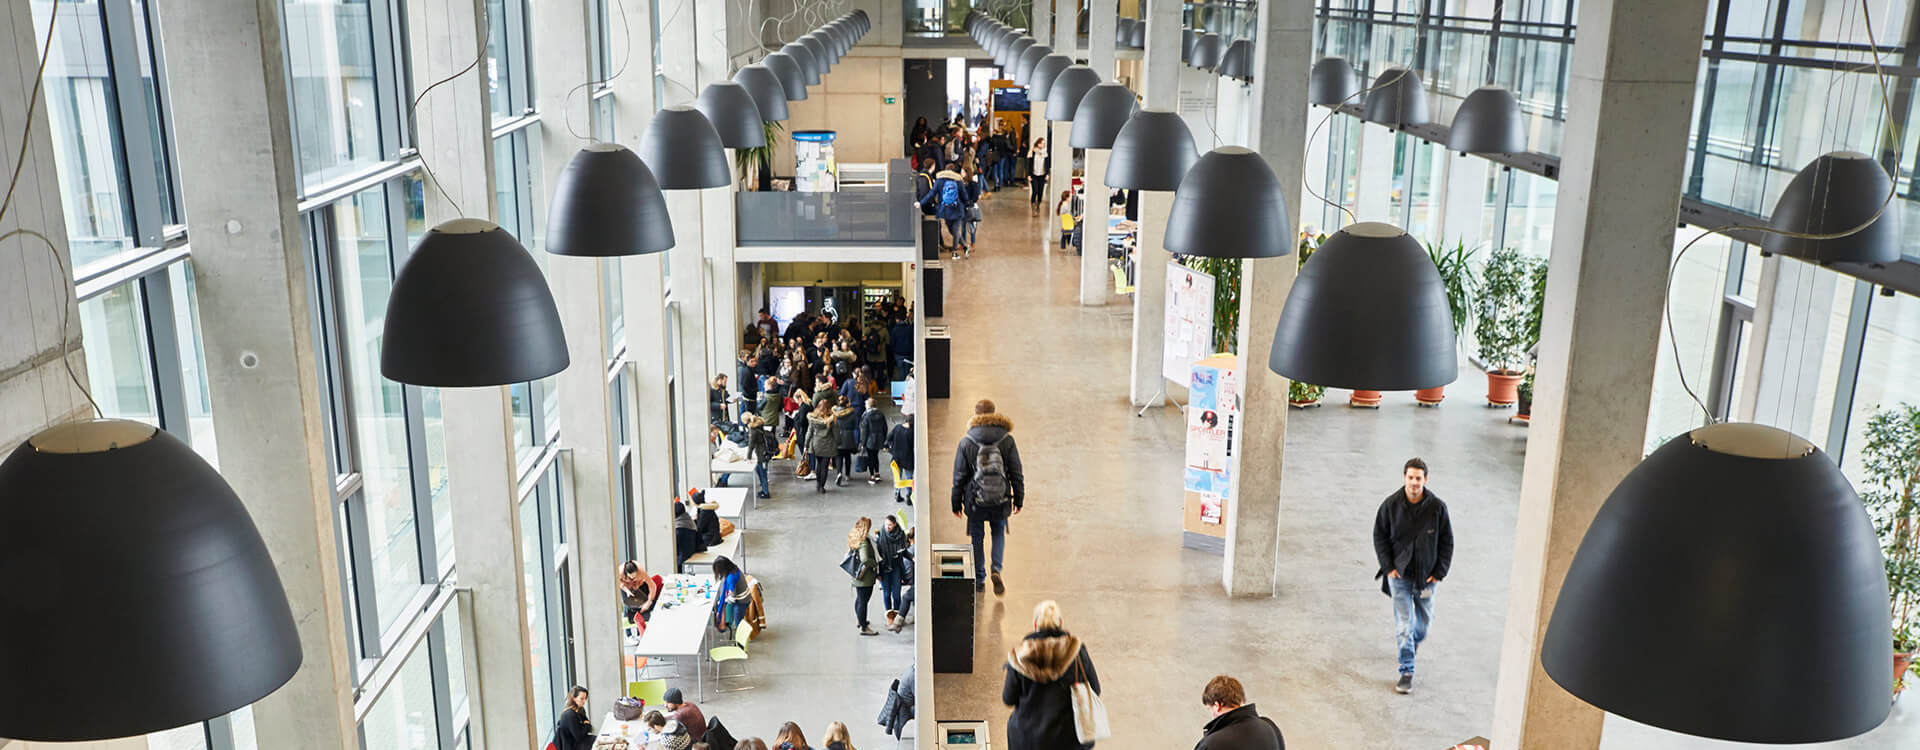 Hochschule Mainz Bewerben 4